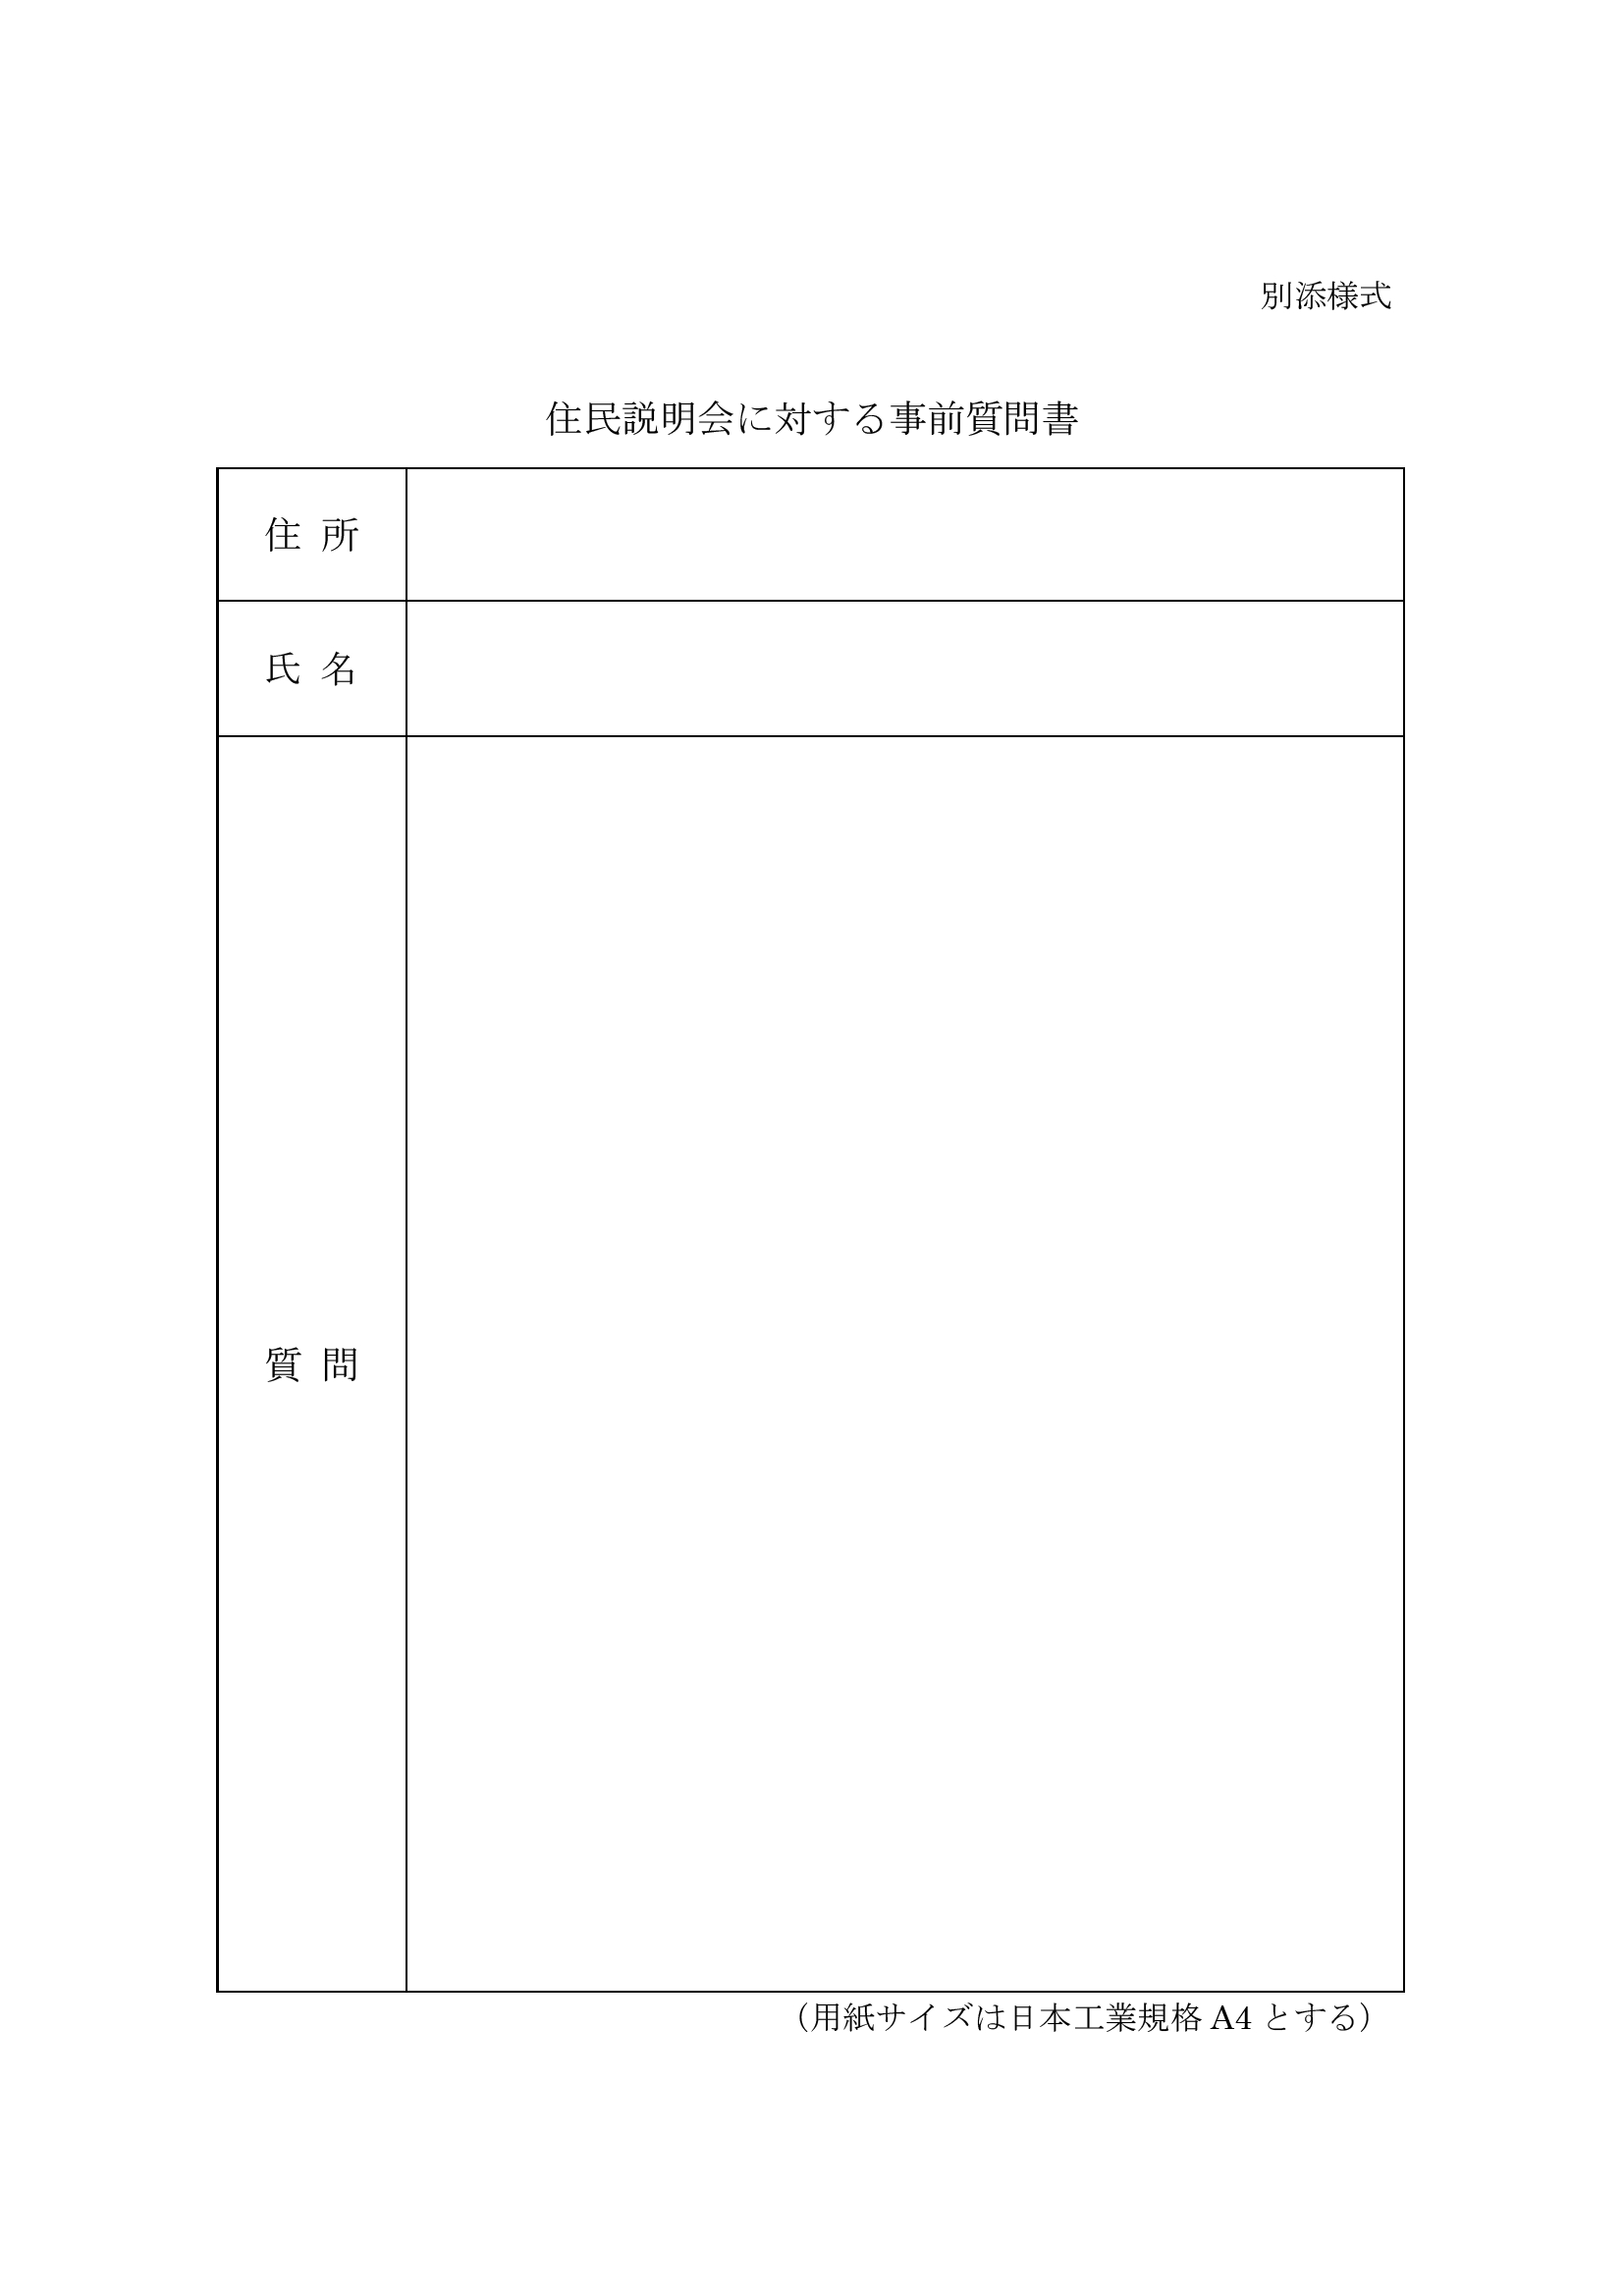 20160411223216dcc.jpg